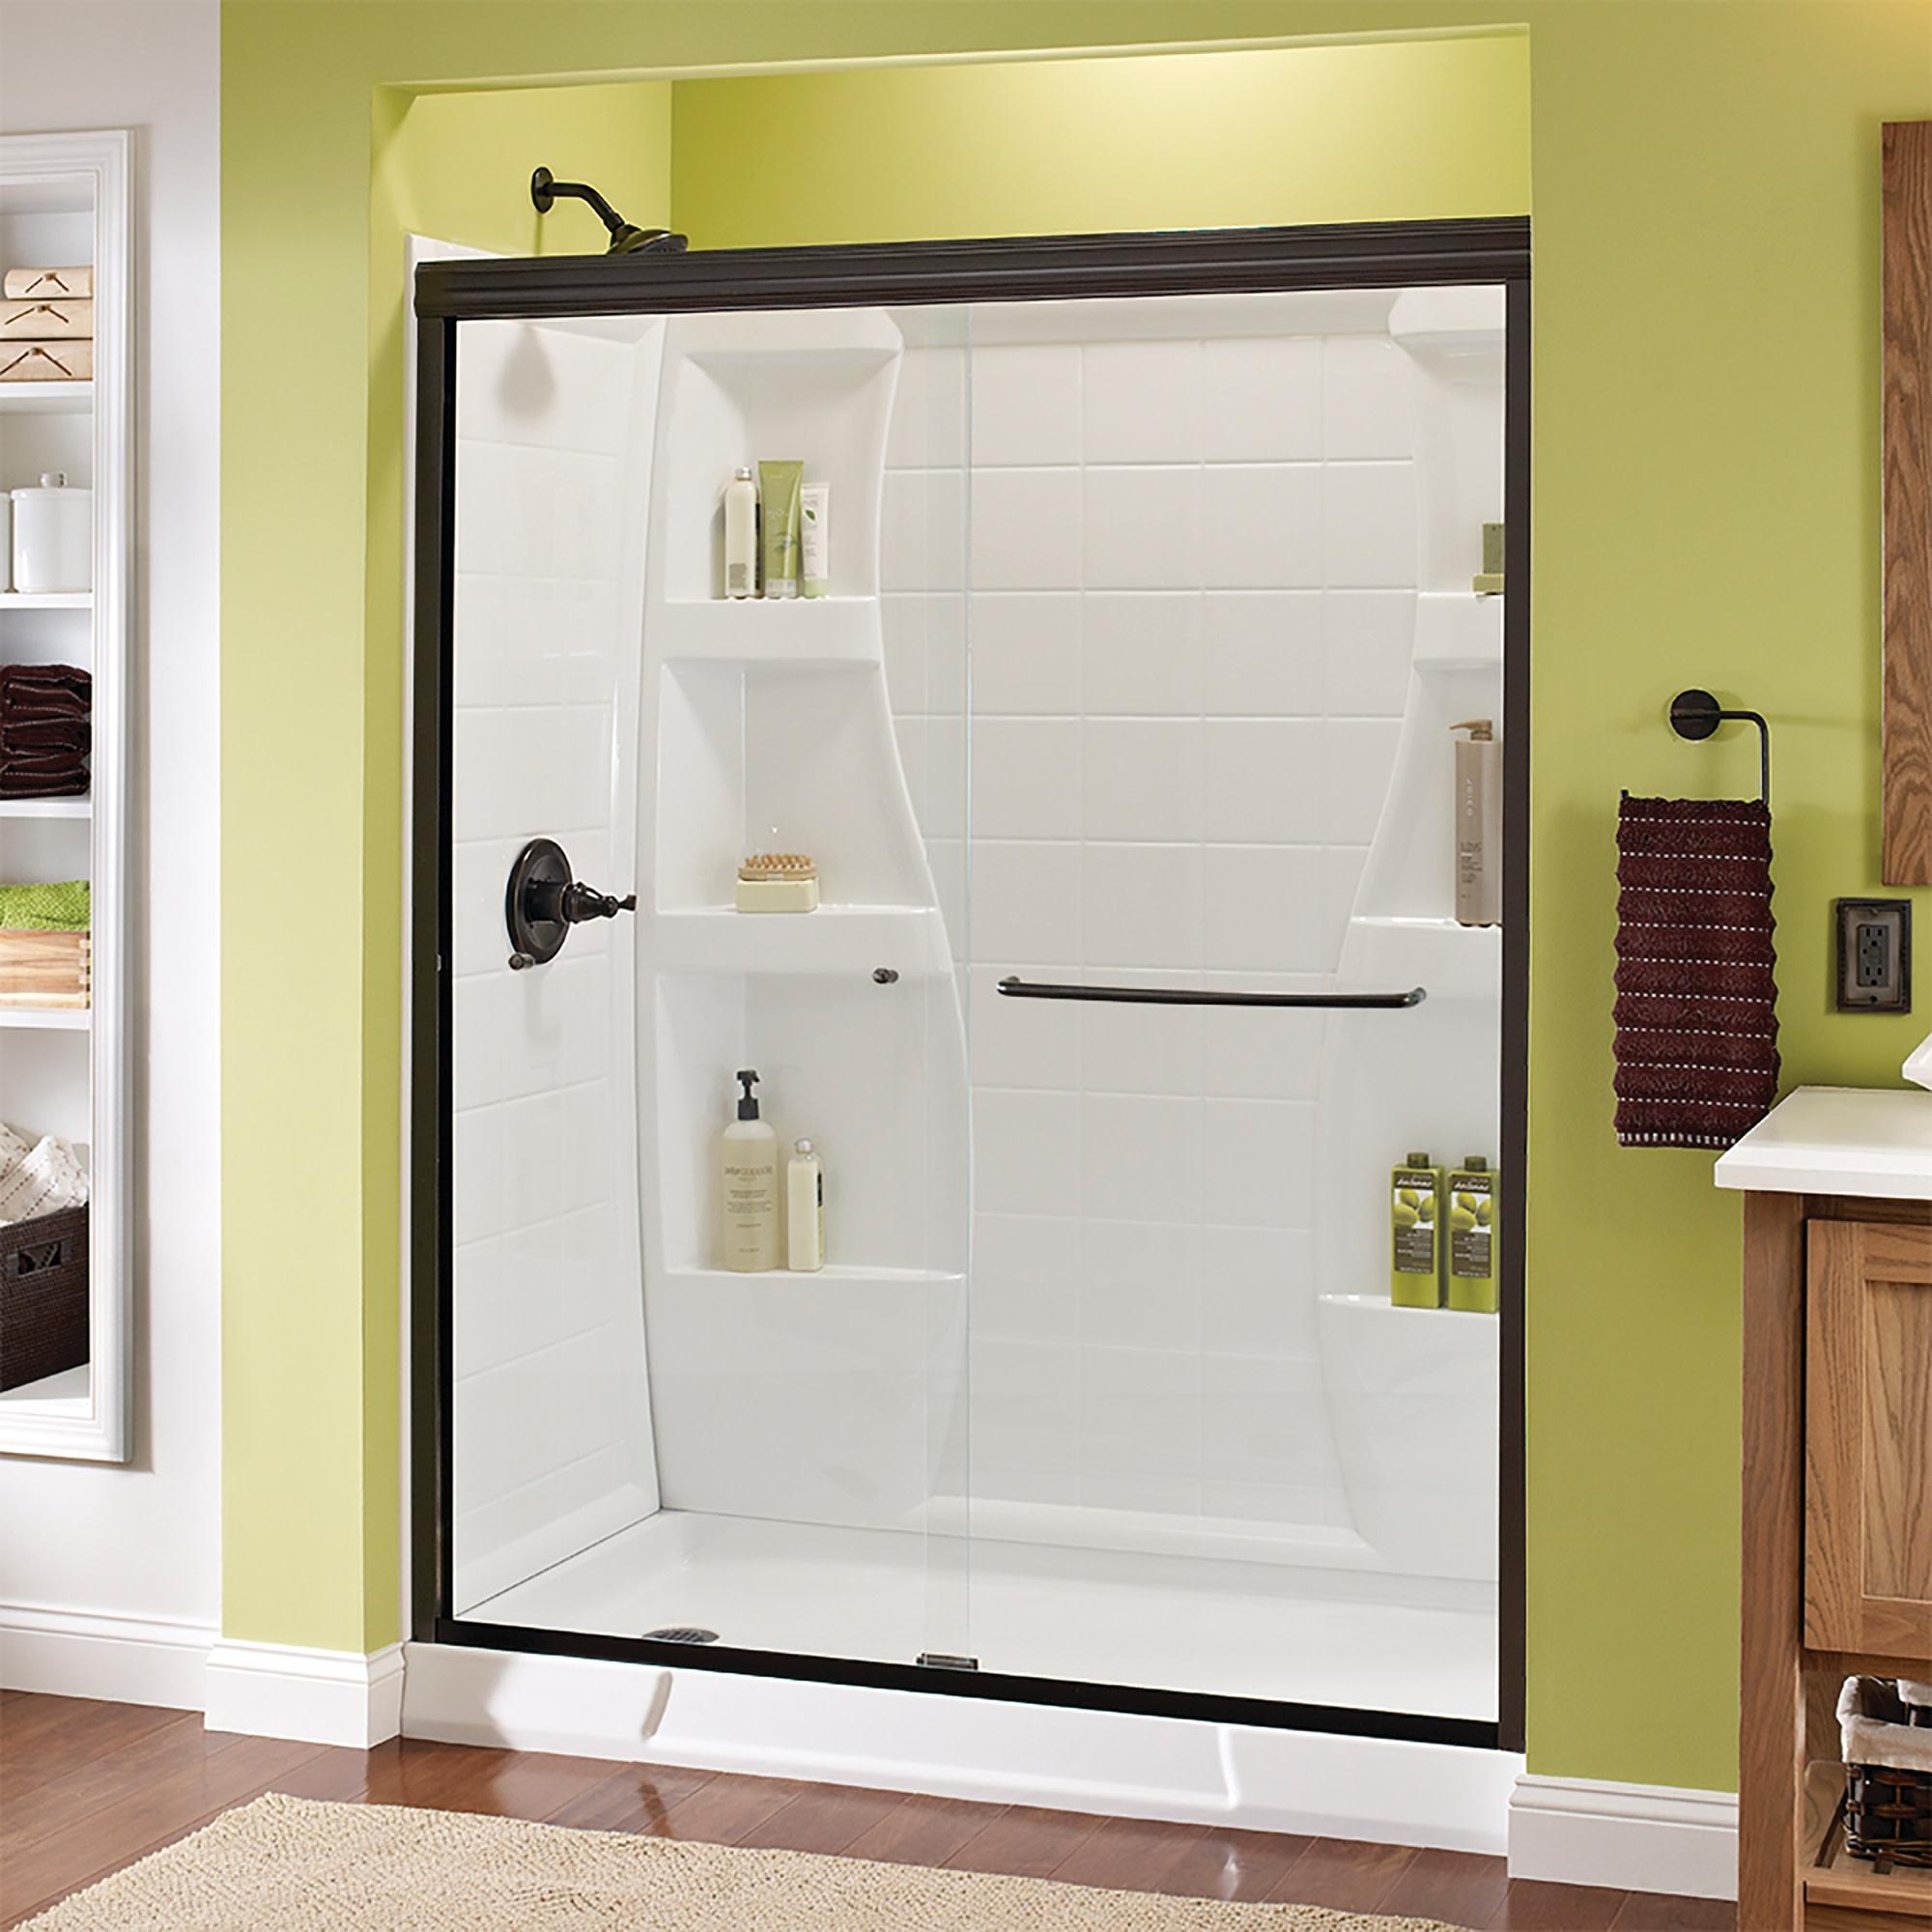 Delta Sd3956978 Classic 70 High X 59 3 8 Wide Sliding Semi Frameless Shower Door With Clear Glass Bronze